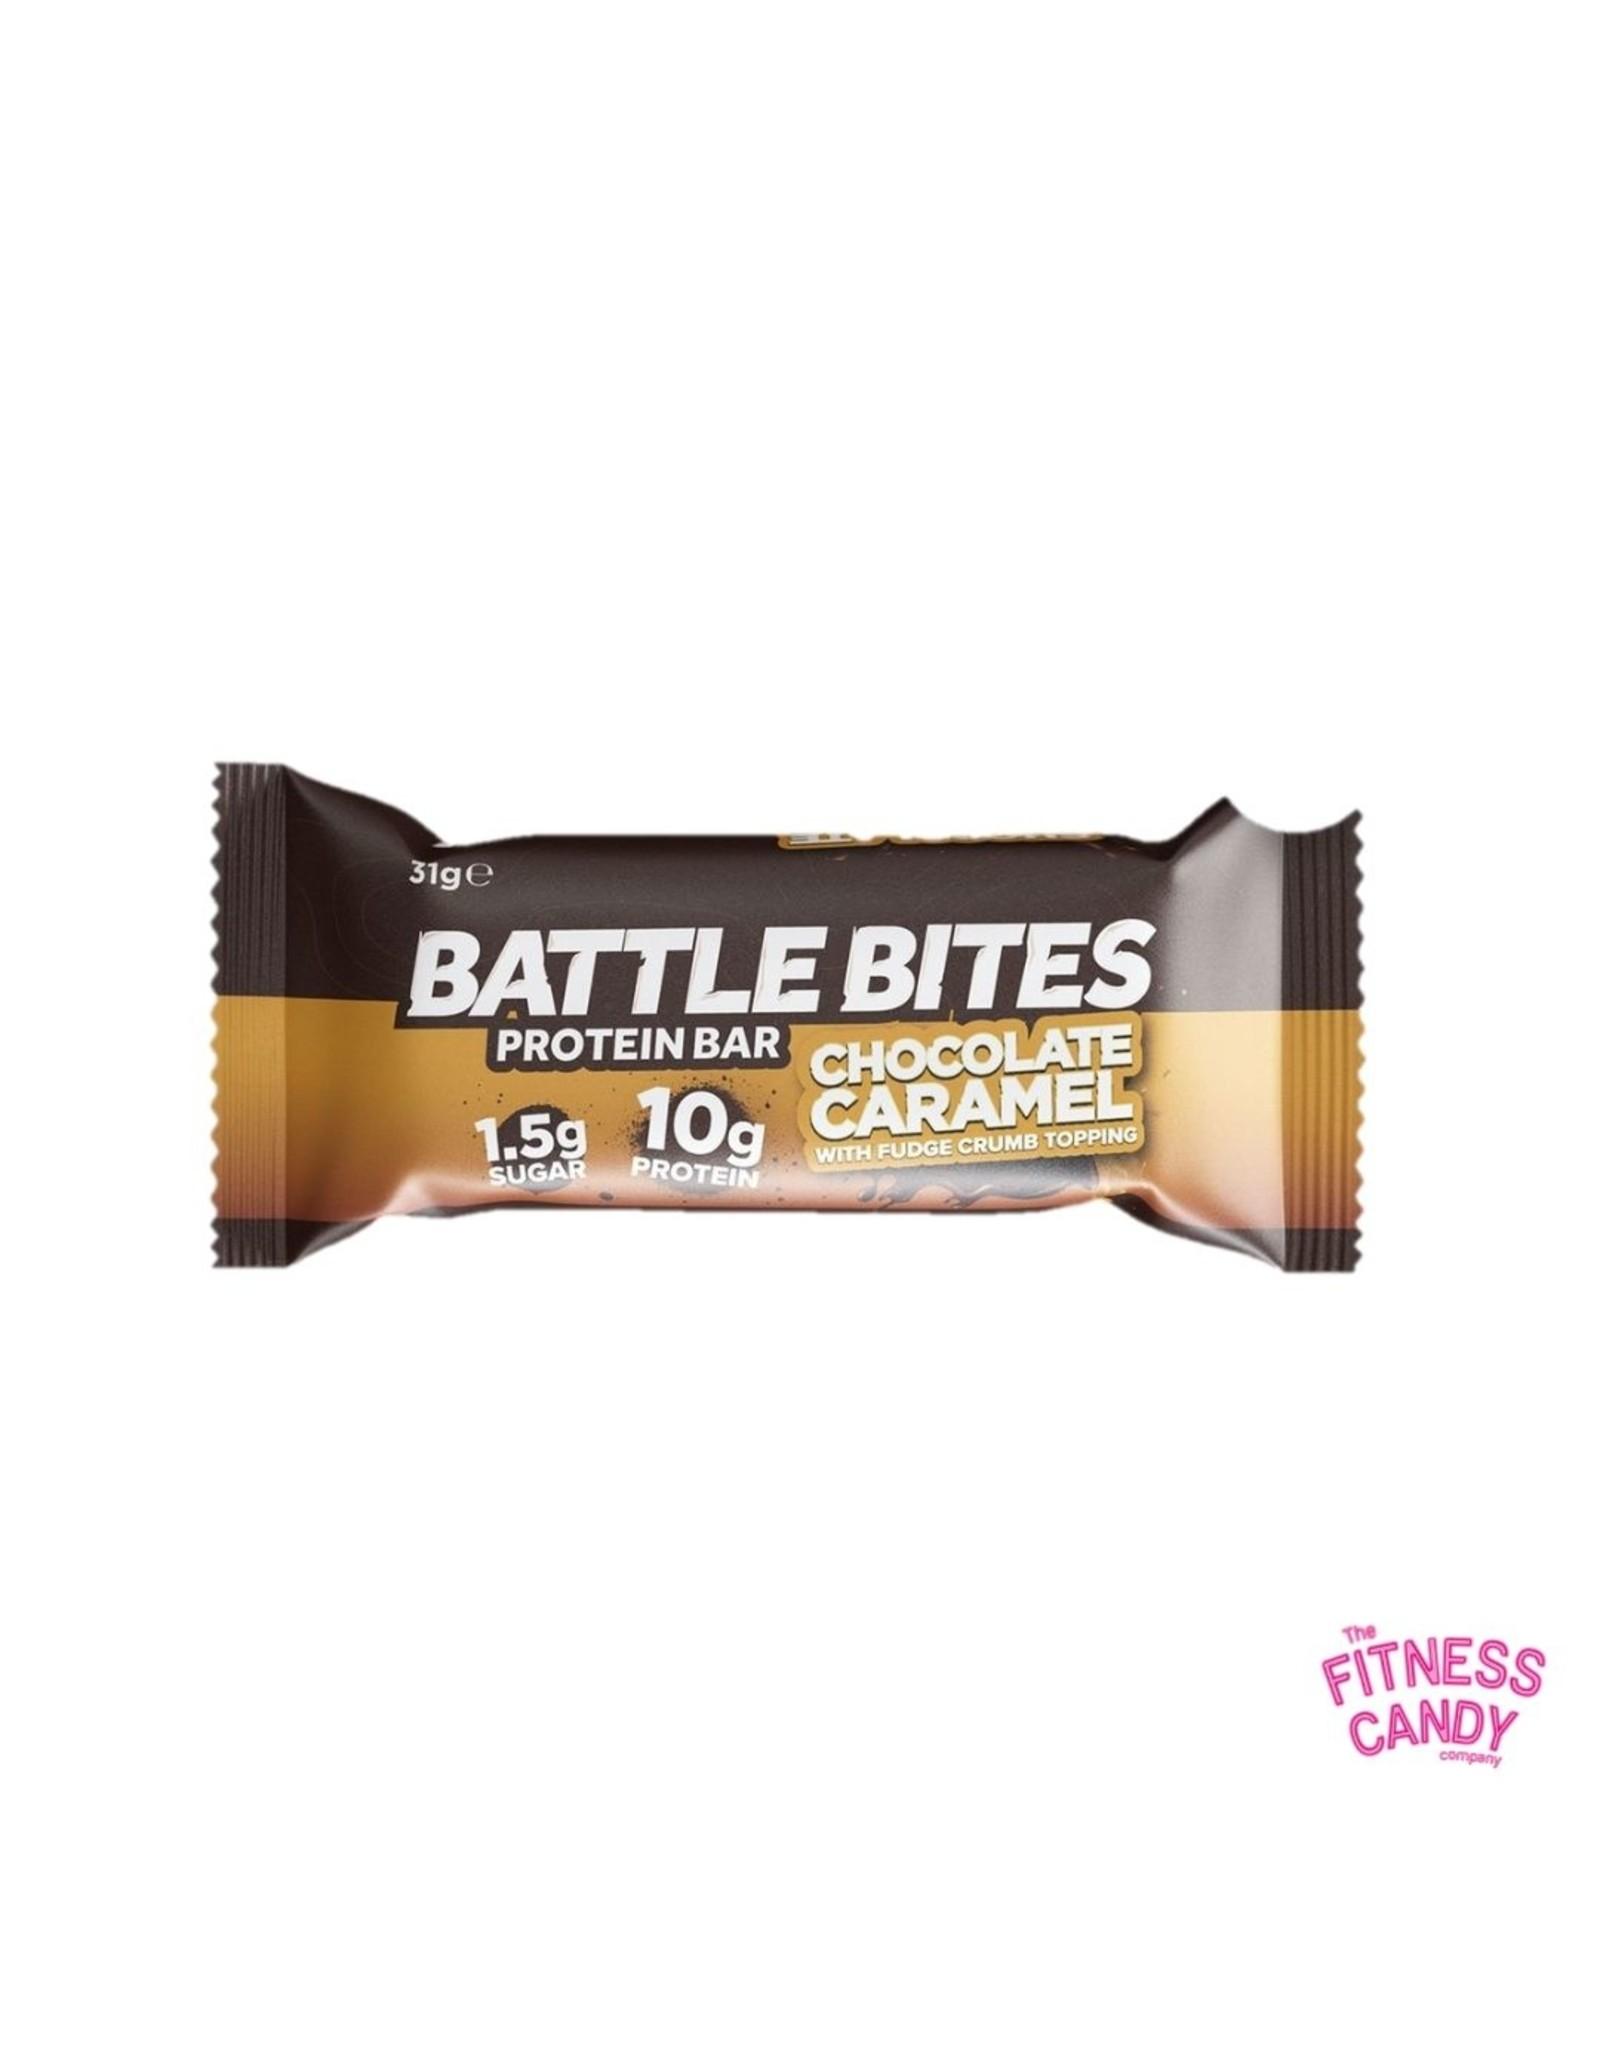 BATTLE BITES BATTLE BITES MINI chocolate caramel